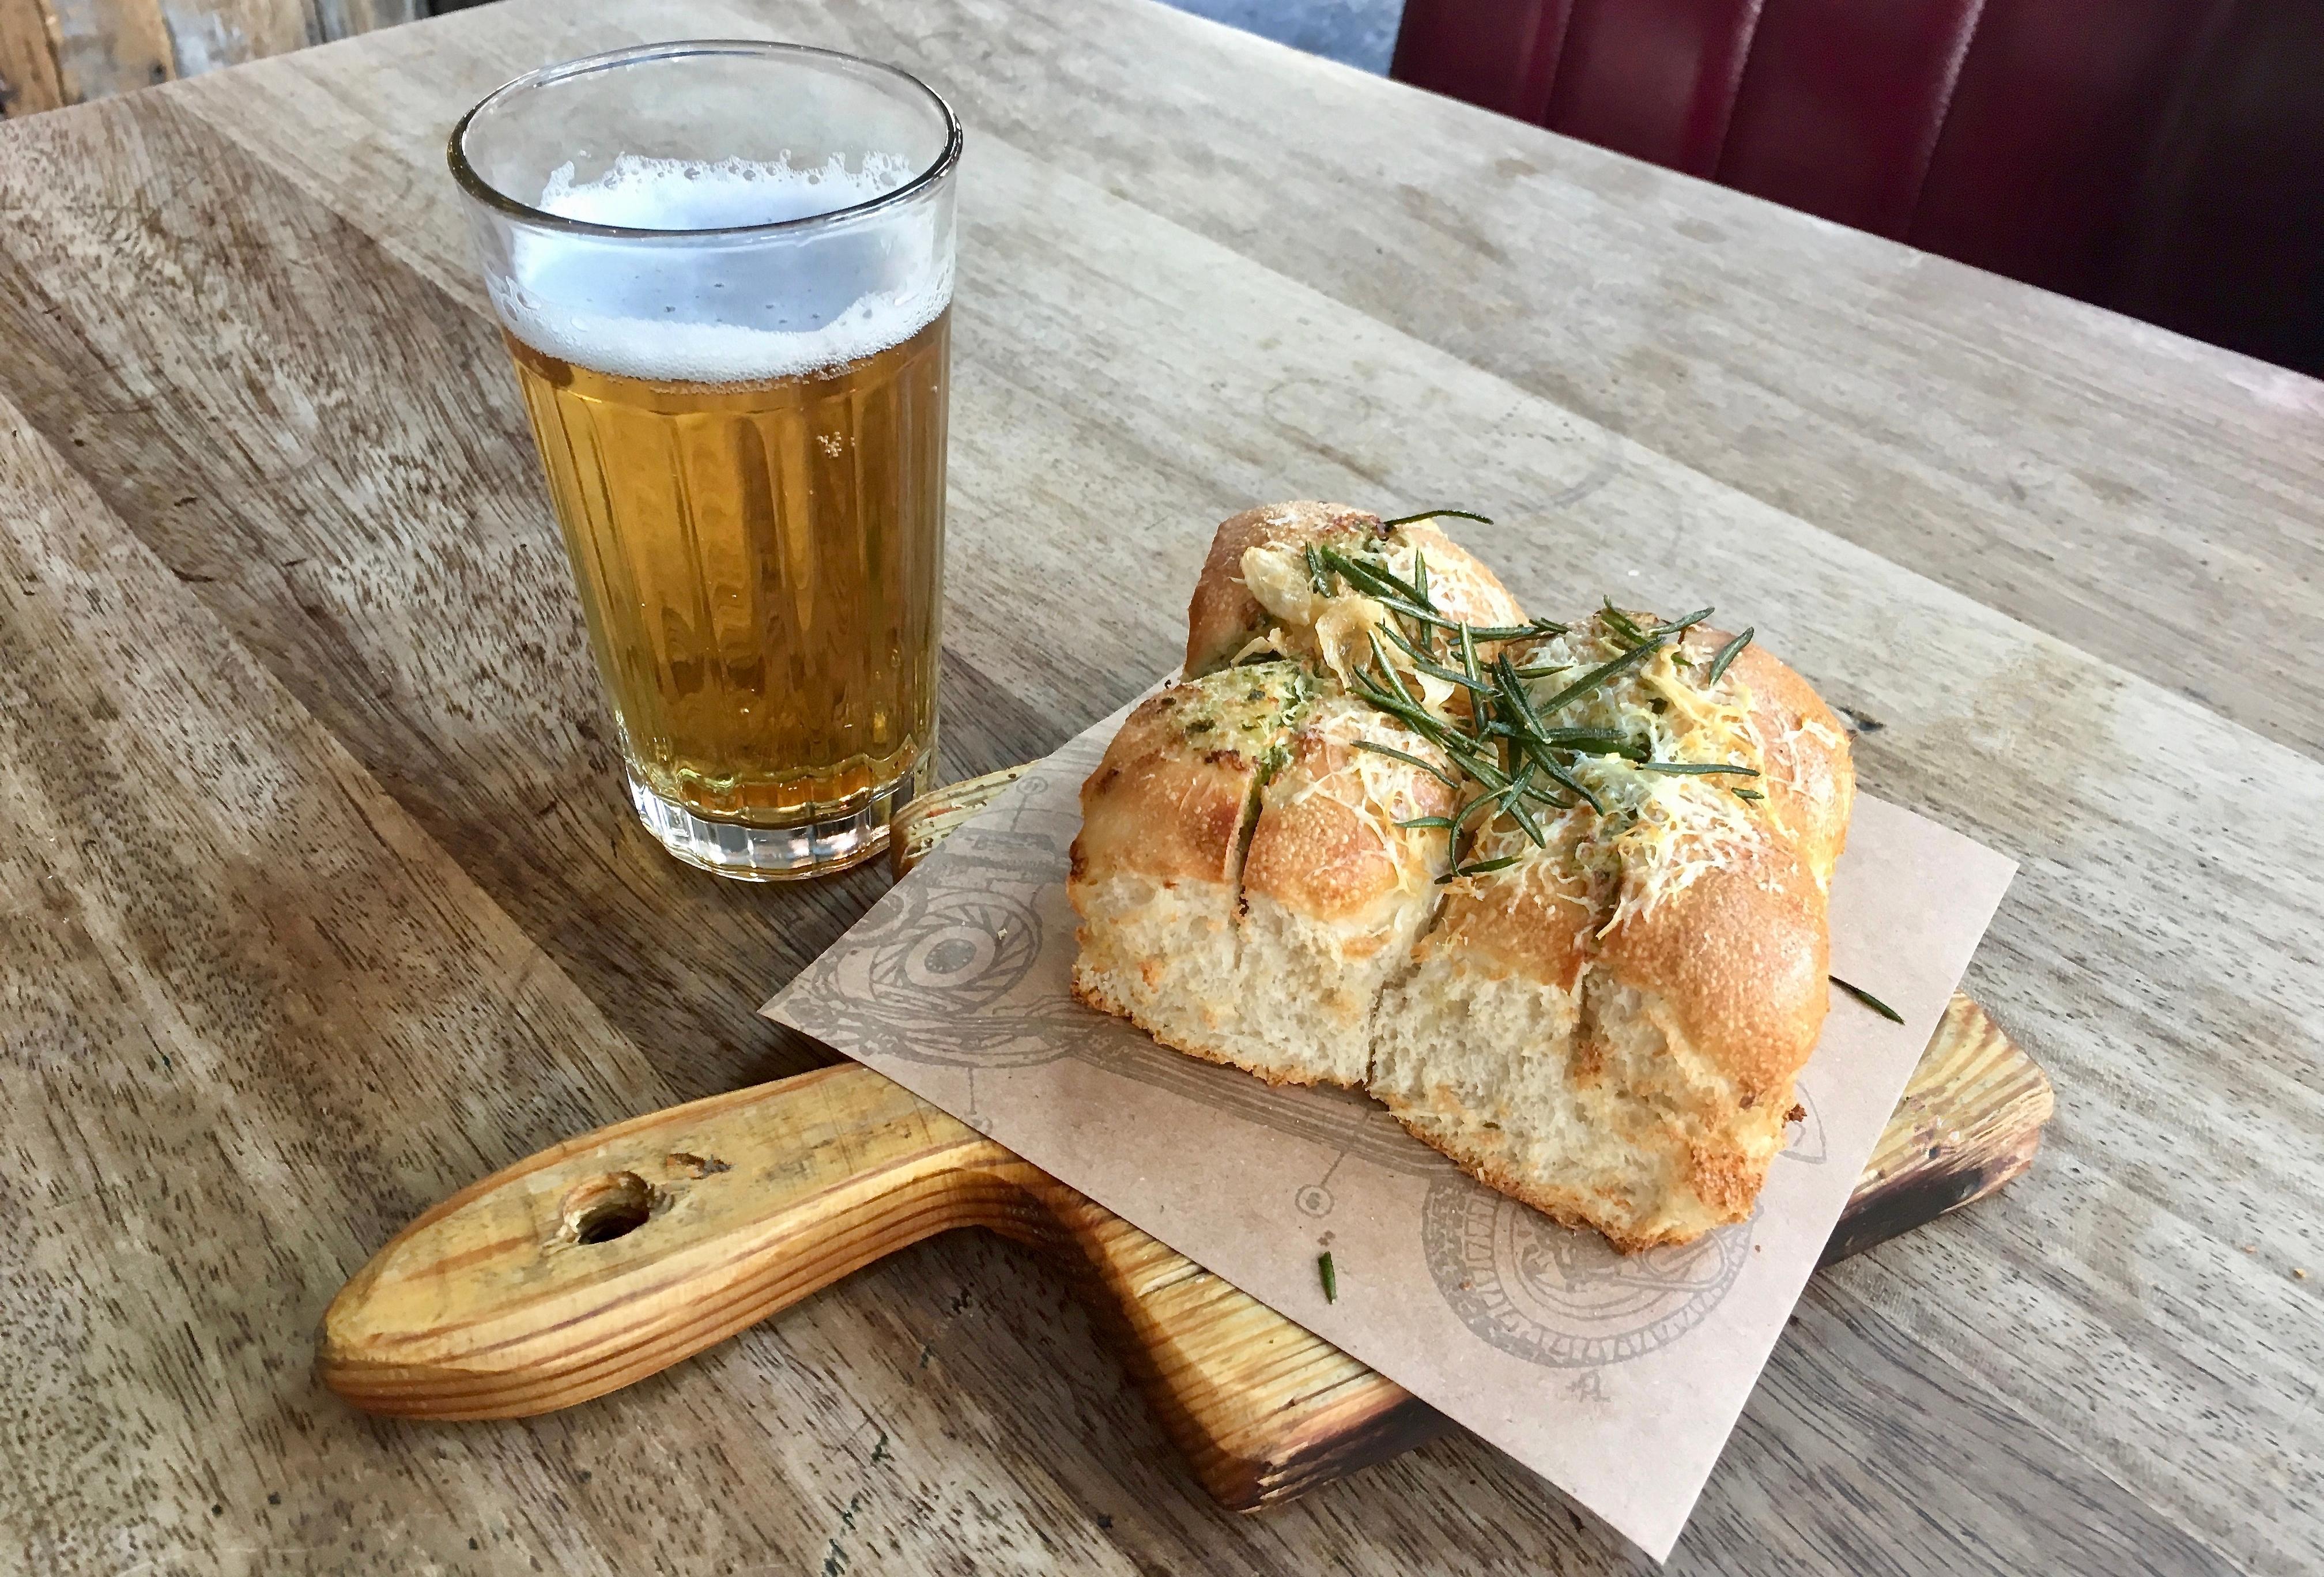 Jamie's Italian Garlic Bread